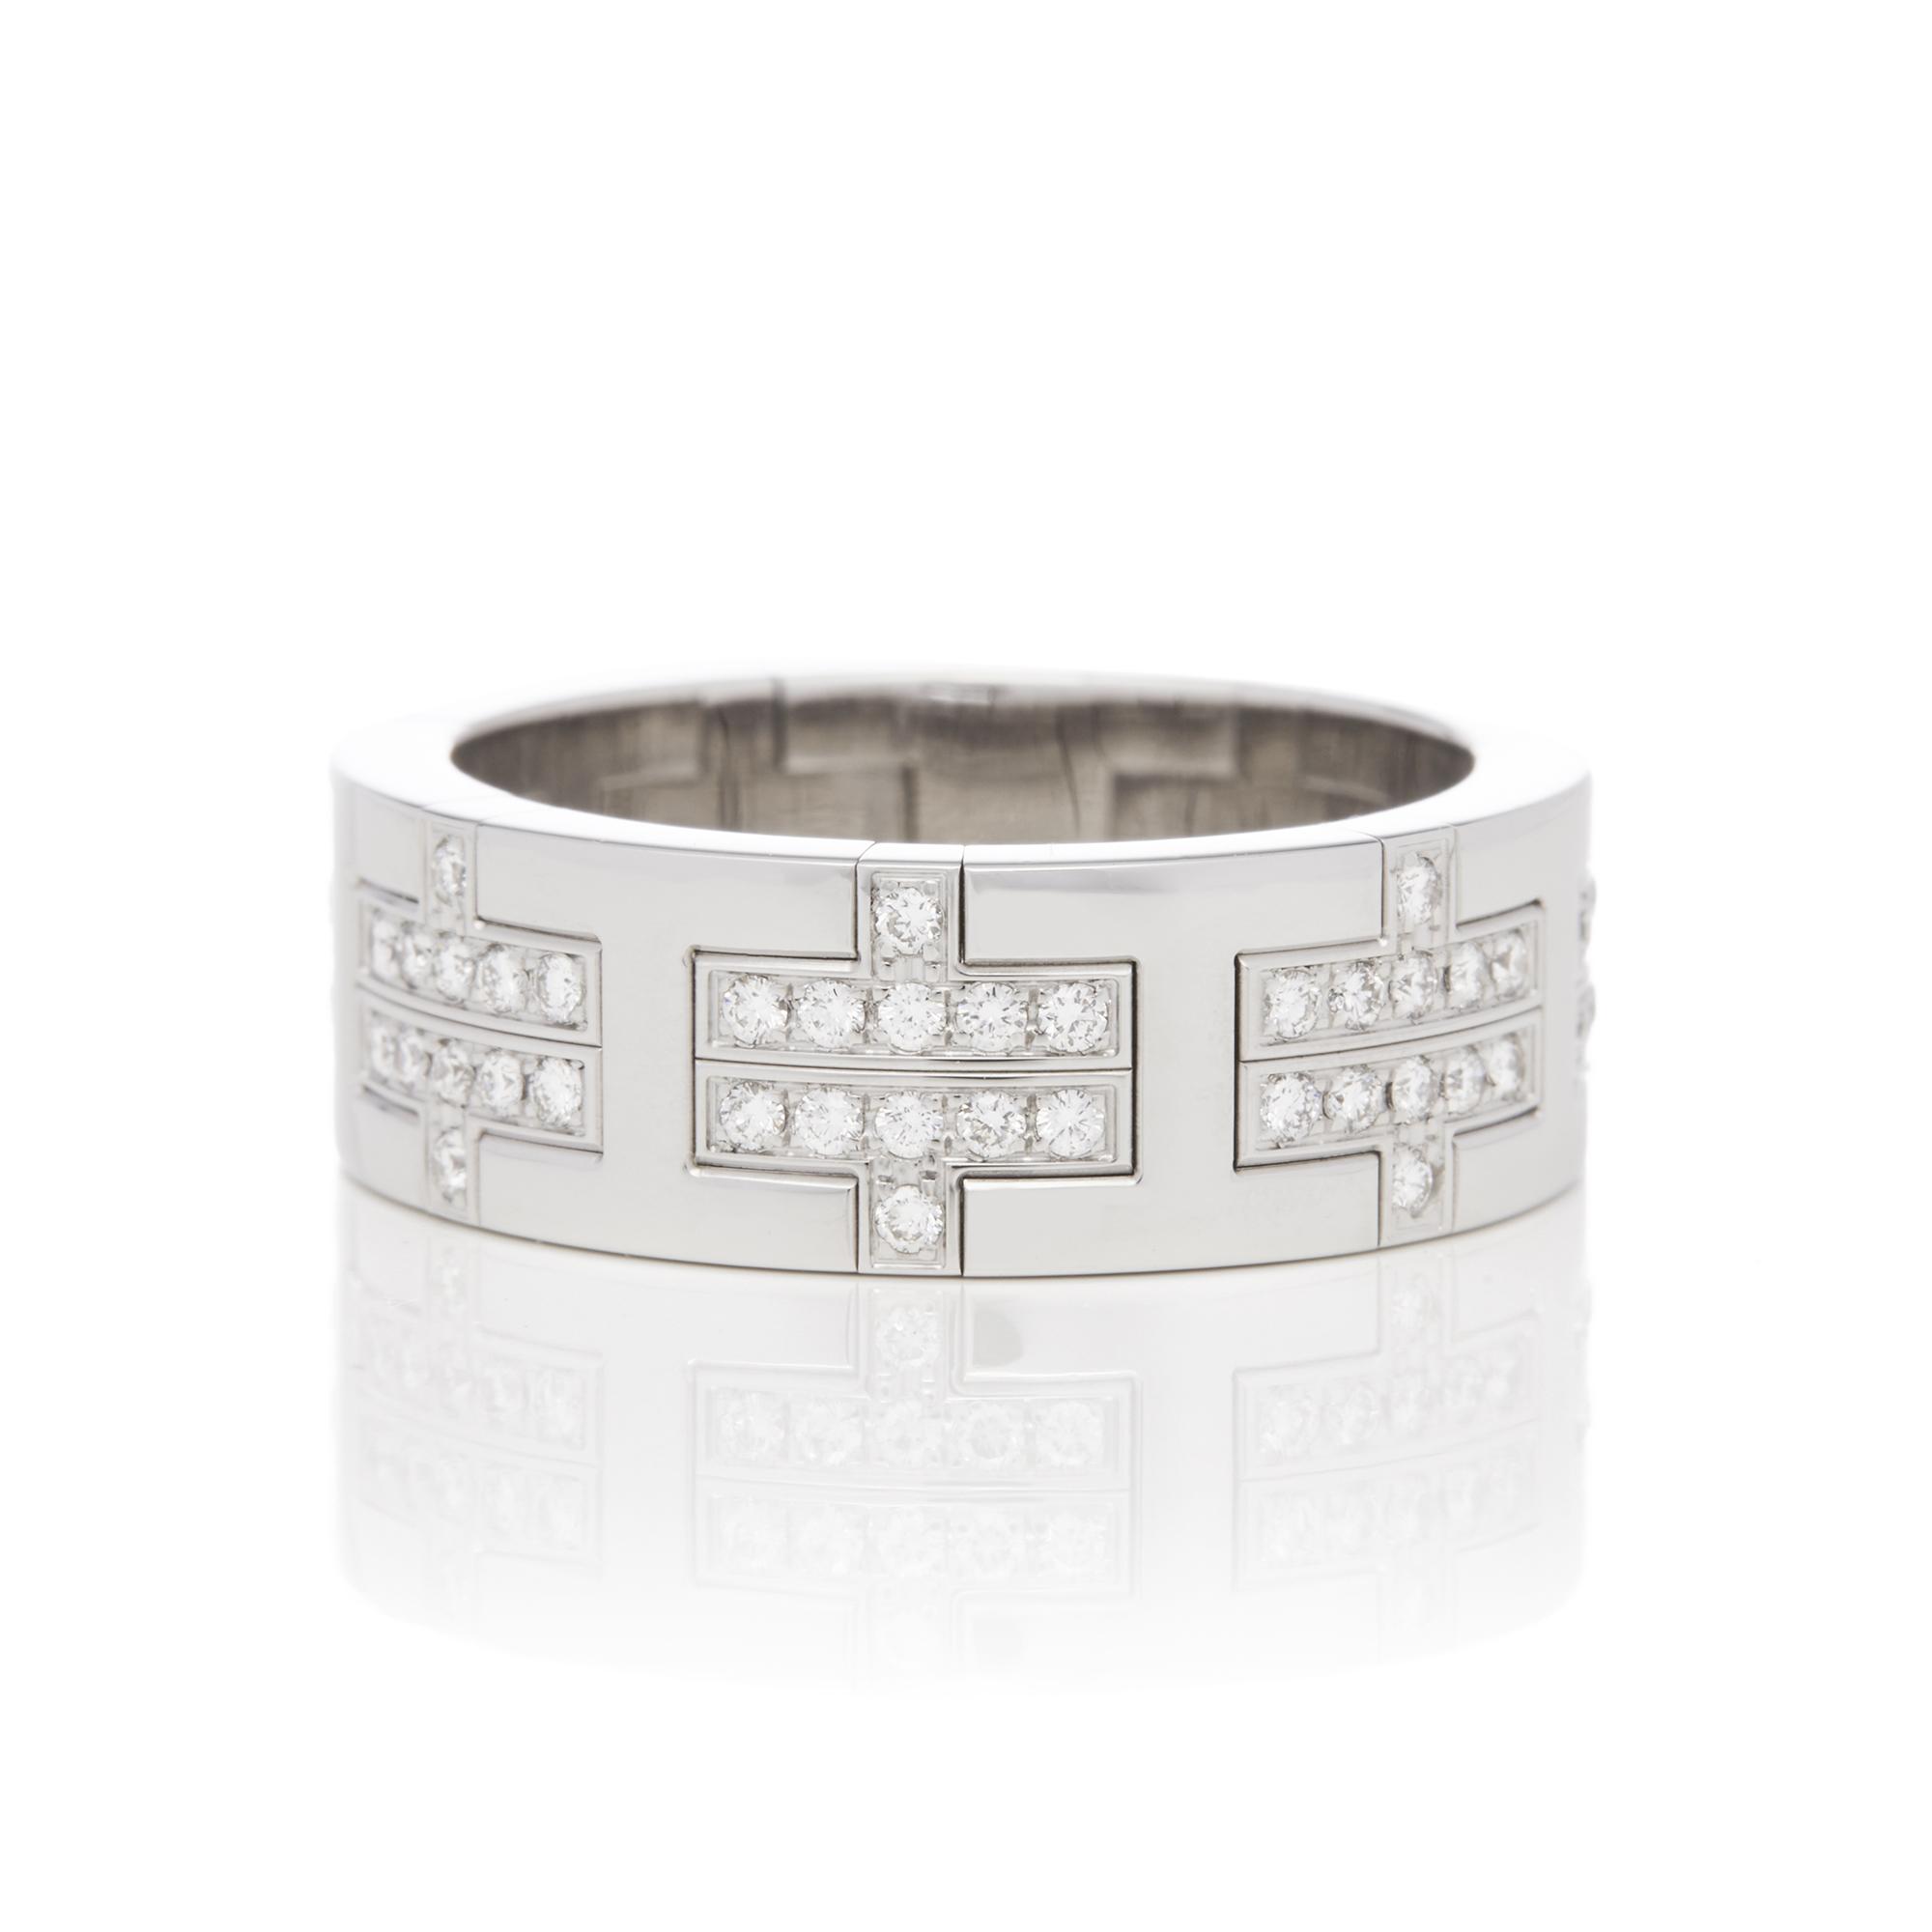 Hermes 18ct White Gold Kilim Diamond Ring - Image 6 of 8